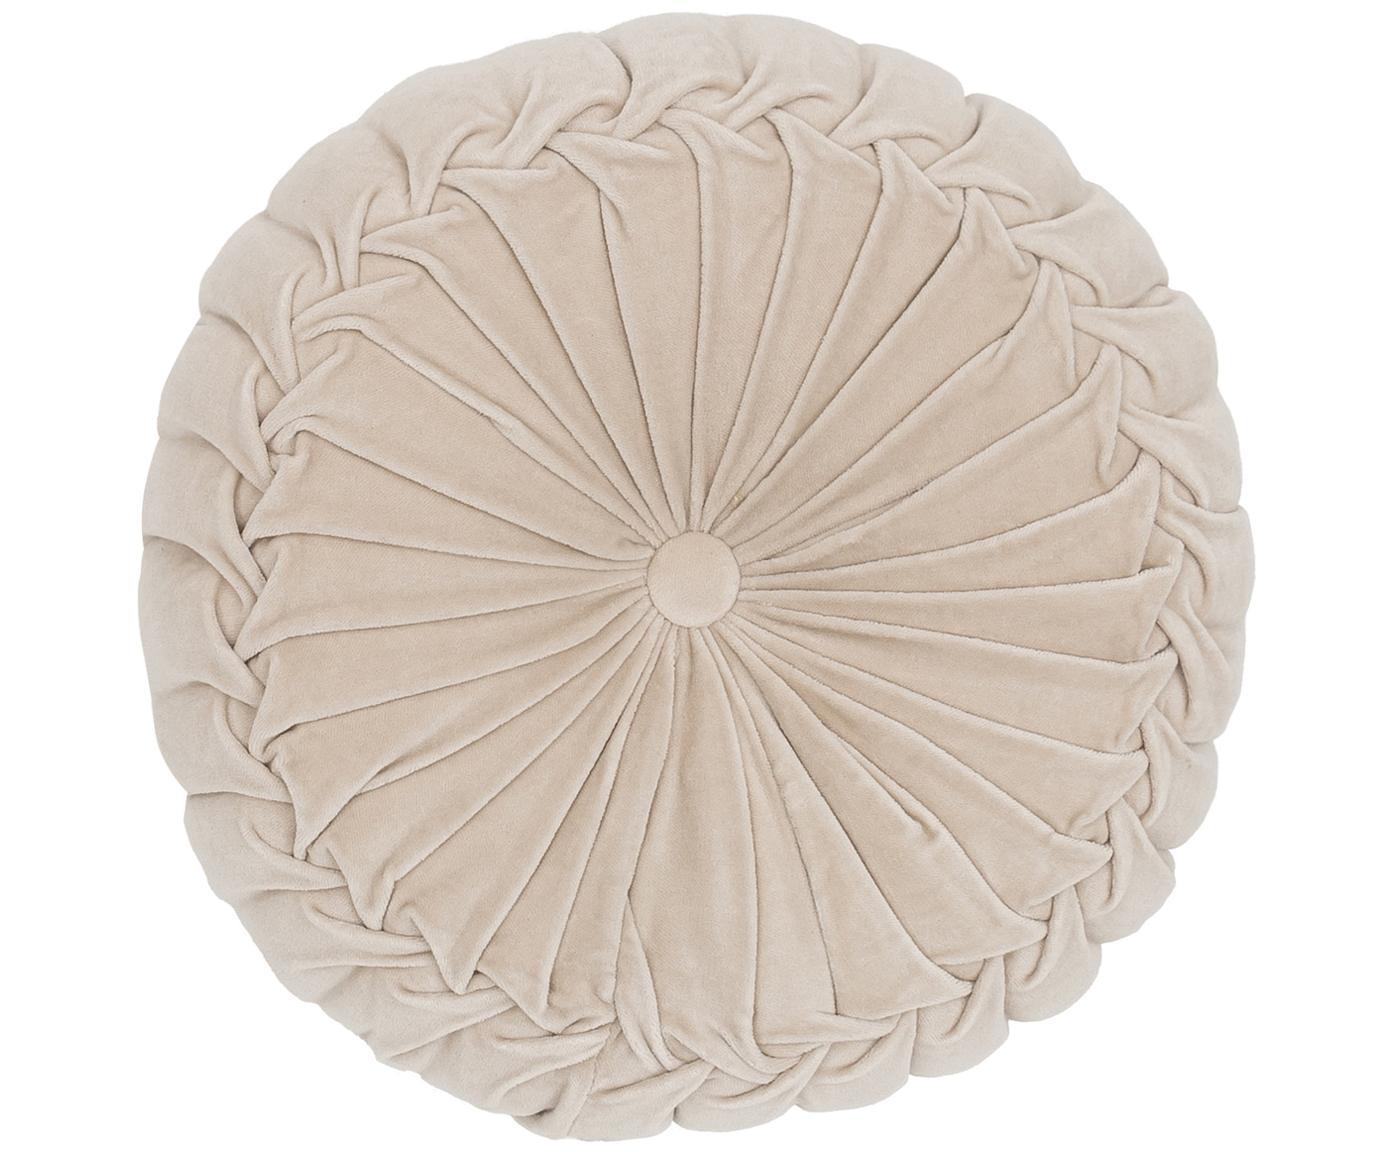 Cuscino rotondo in velluto con imbottitura Kanan, Crema, Ø 40 x Alt. 10 cm